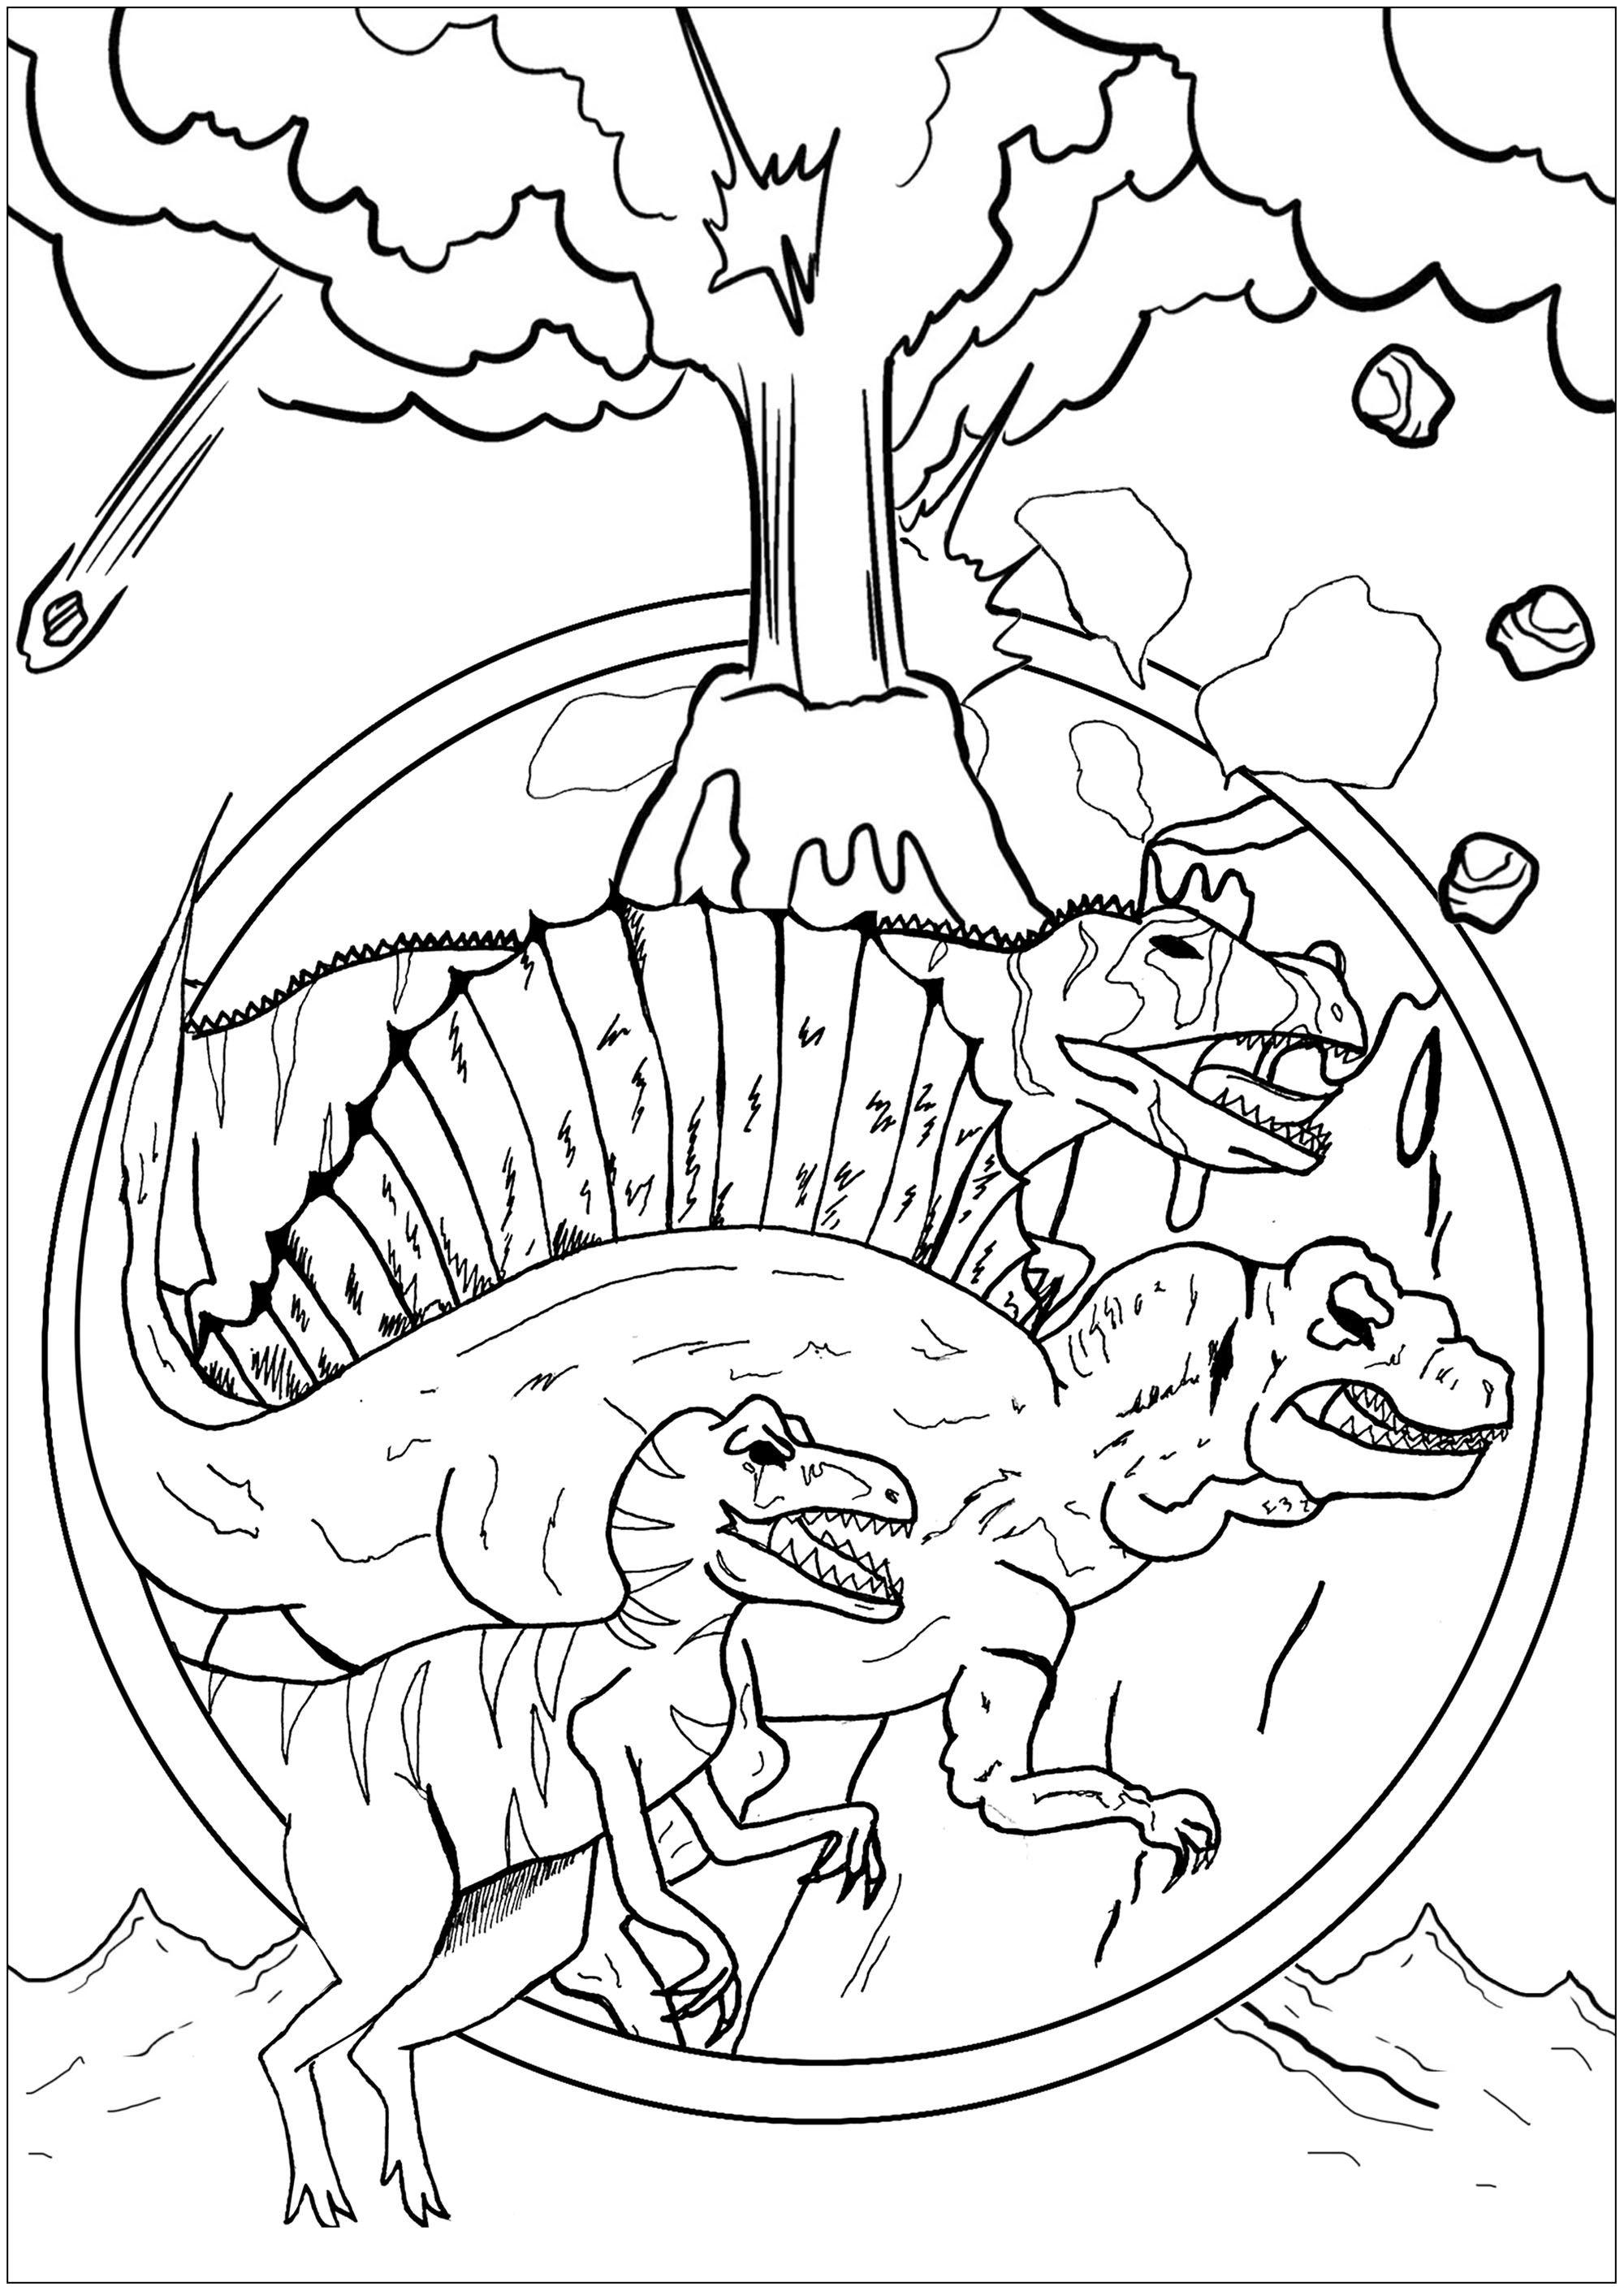 Tree Dinosaurs Velociraptor Spinosaurus And Eocarcharia Threatened By An Erupting Volcano Dinosaur Coloring Pages Dinosaur Coloring Coloring Pages